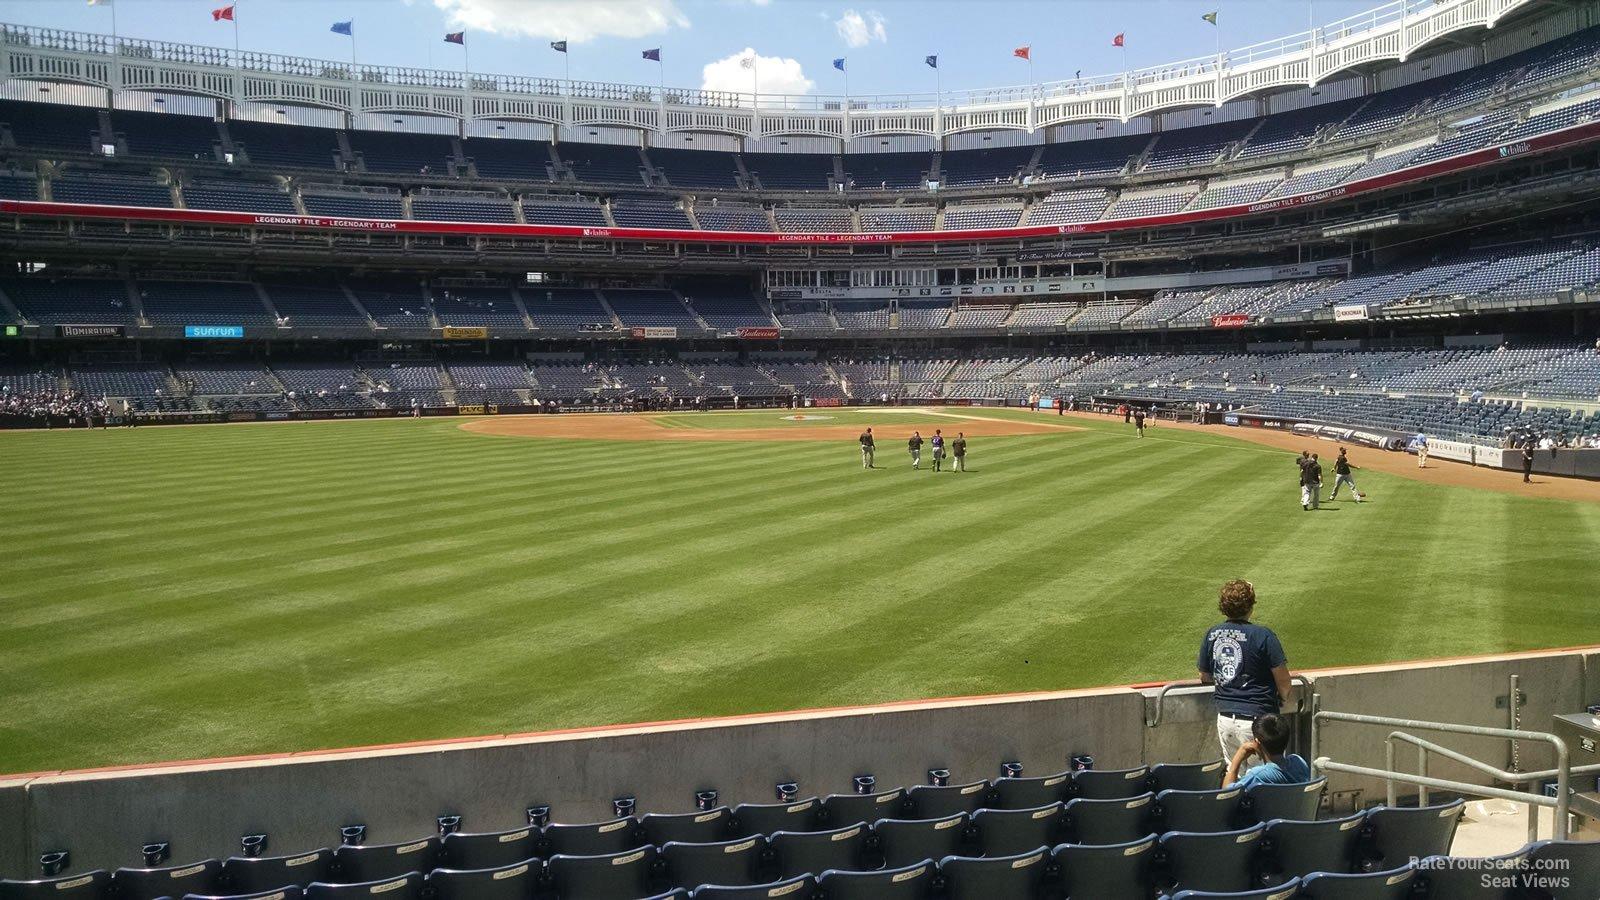 Yankee Stadium Section 136 - New York Yankees - RateYourSeats.com